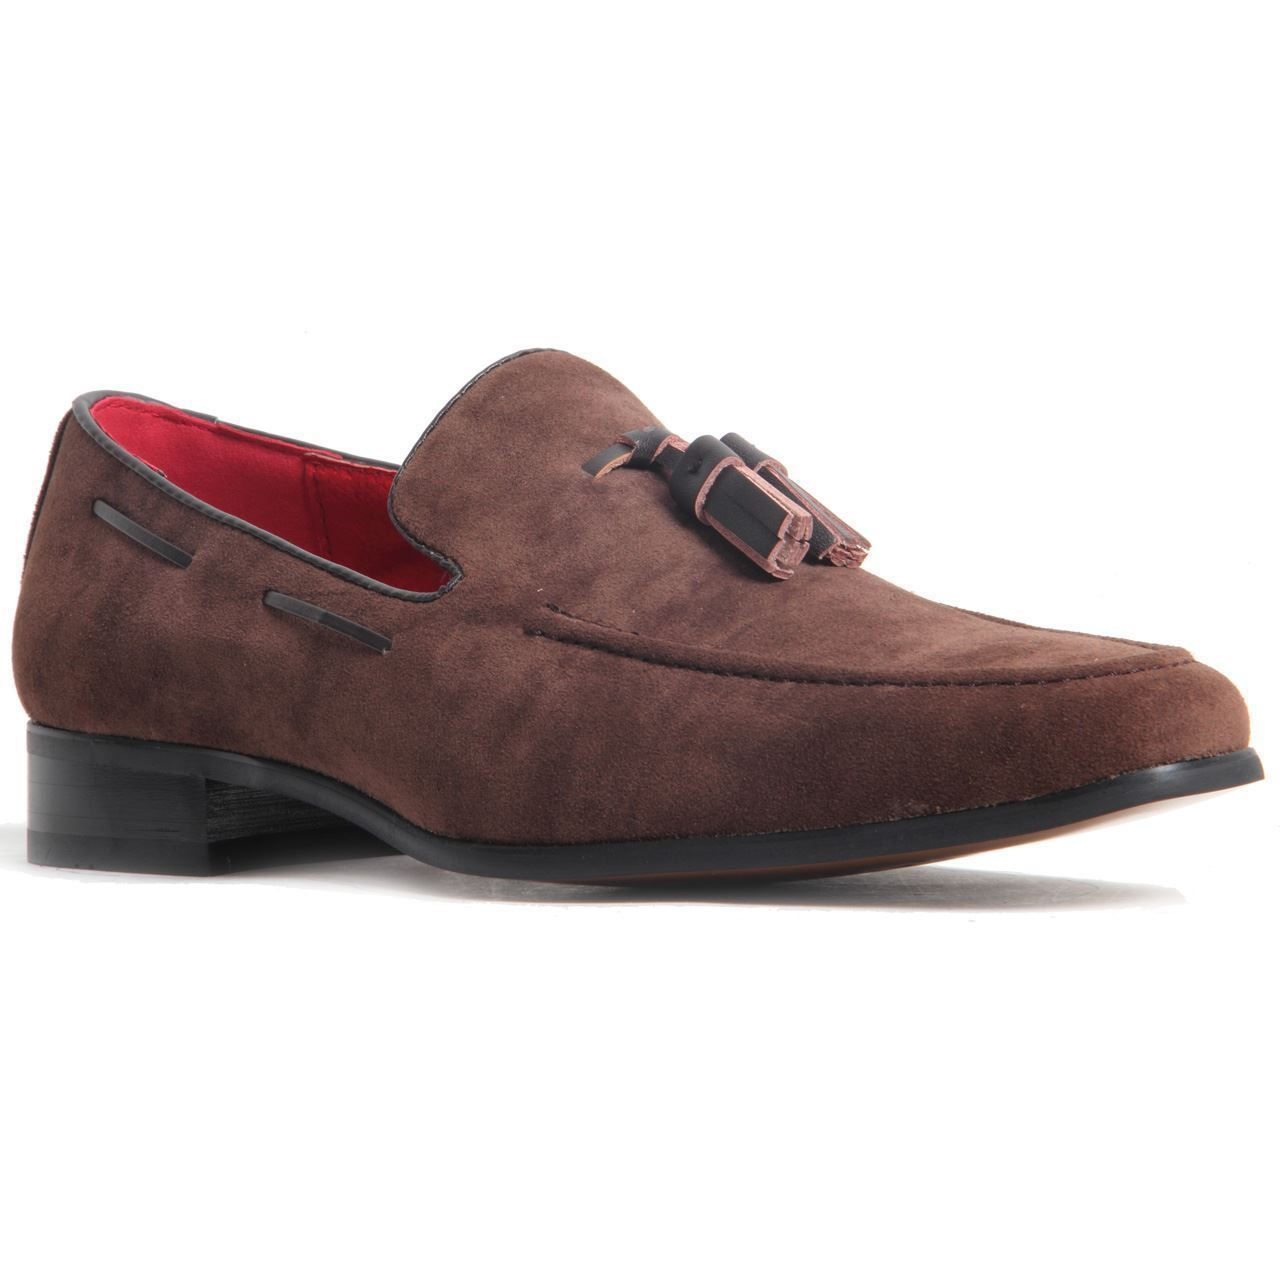 Handmade Men's Suede Slip Ons Loafer Tassel Shoes